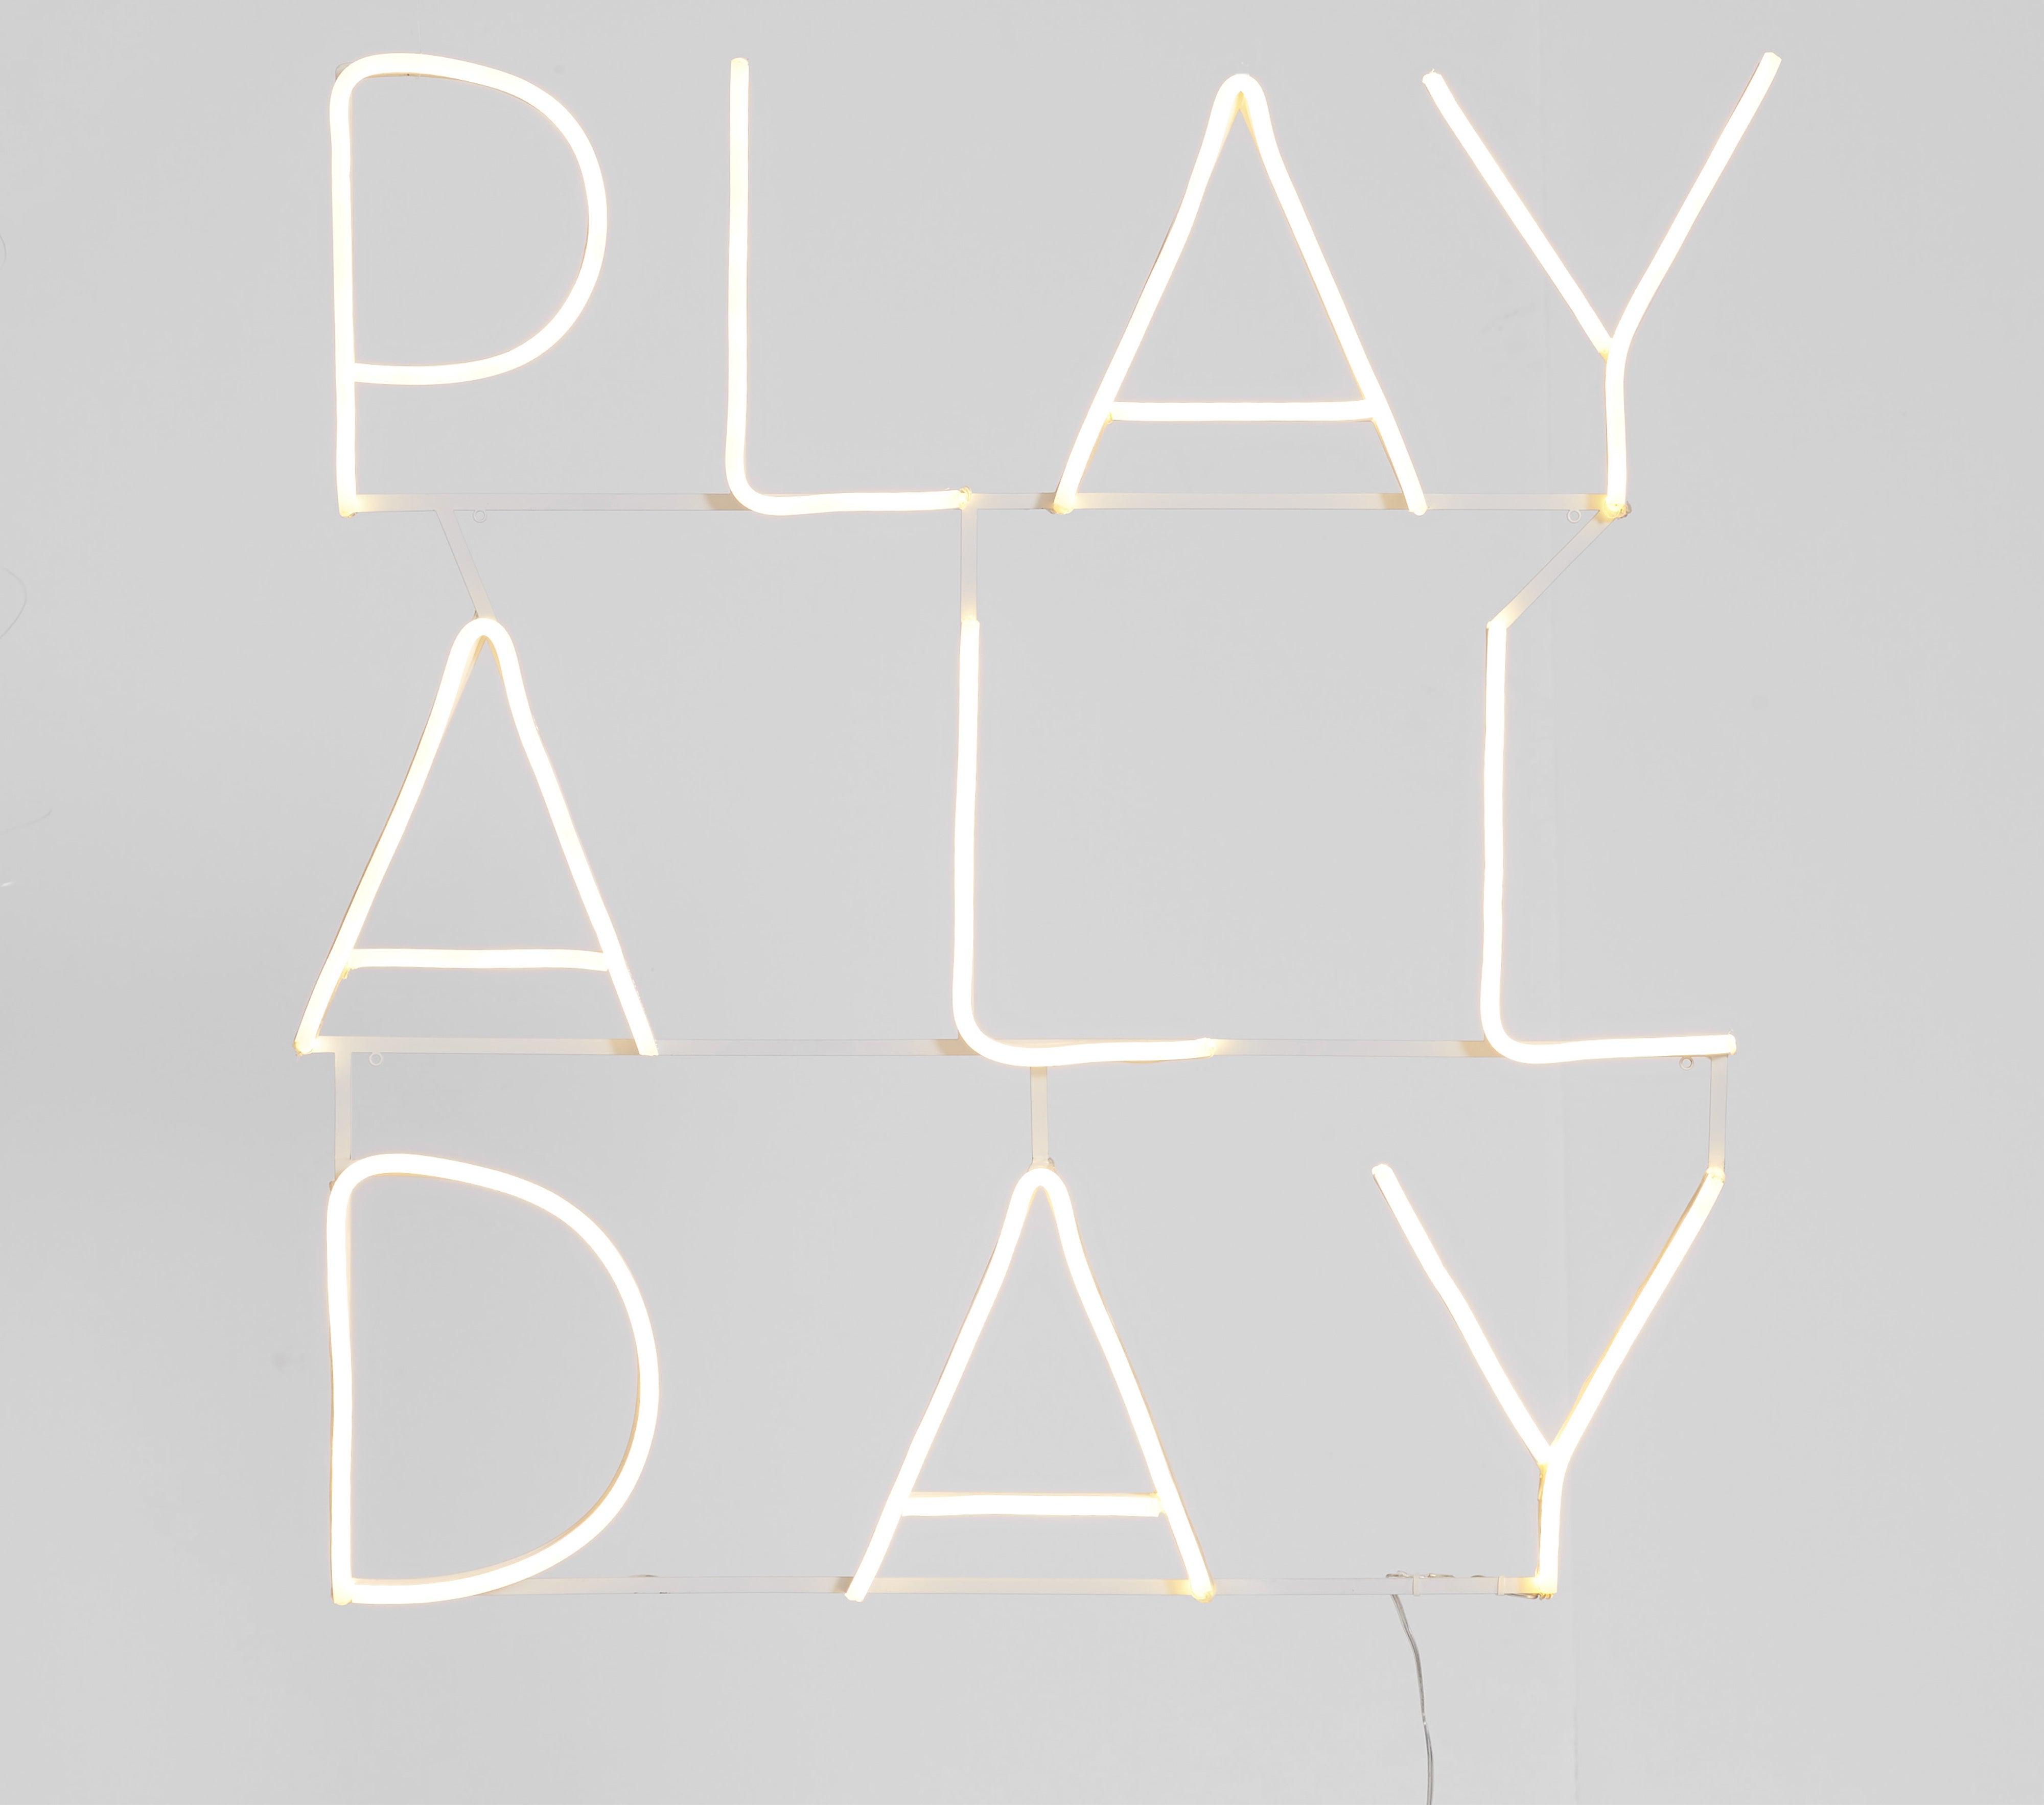 PBK-RZ-Play-All-Day-Neon-Sign-SILO-PR_1